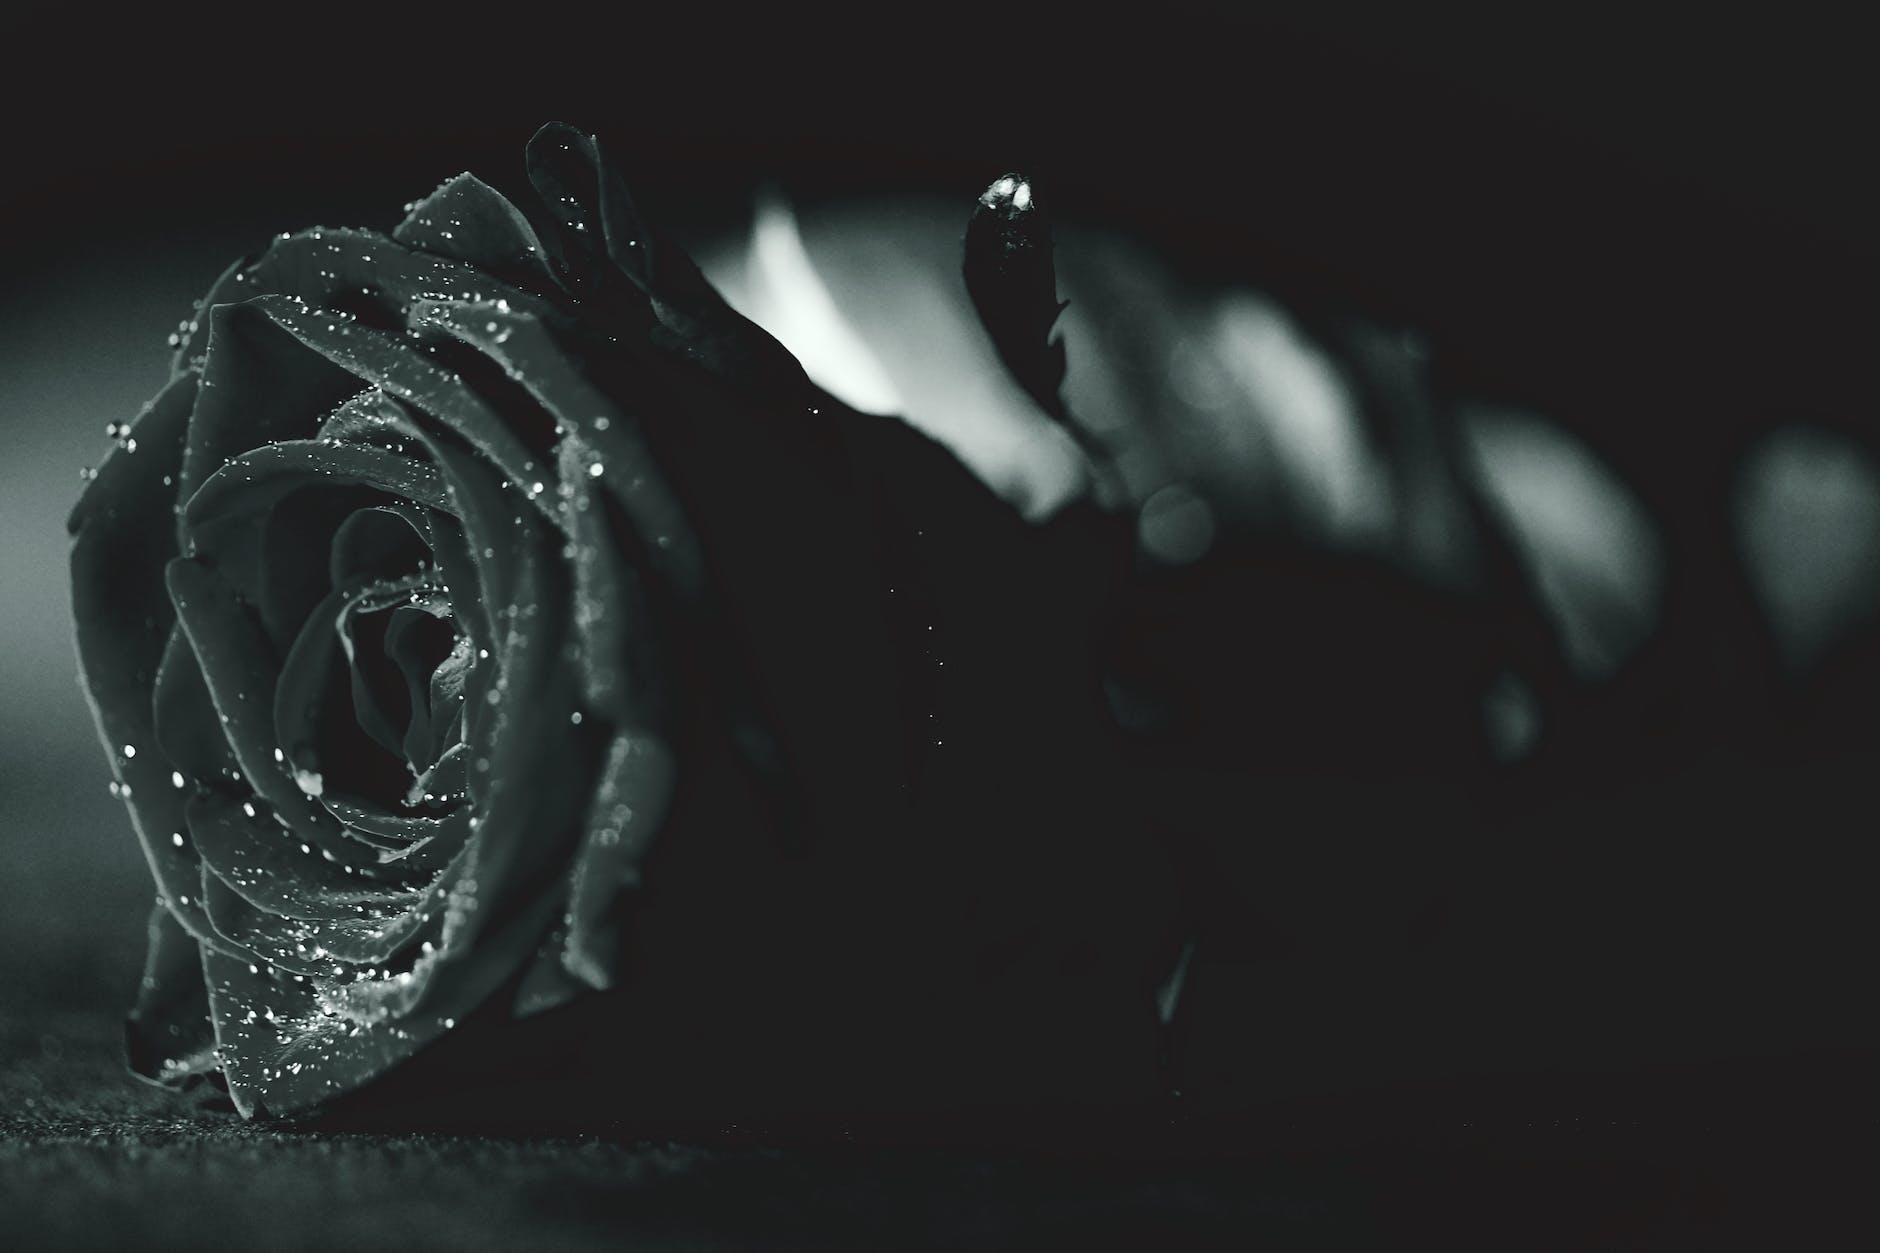 gambar bunga mawar hitam layu